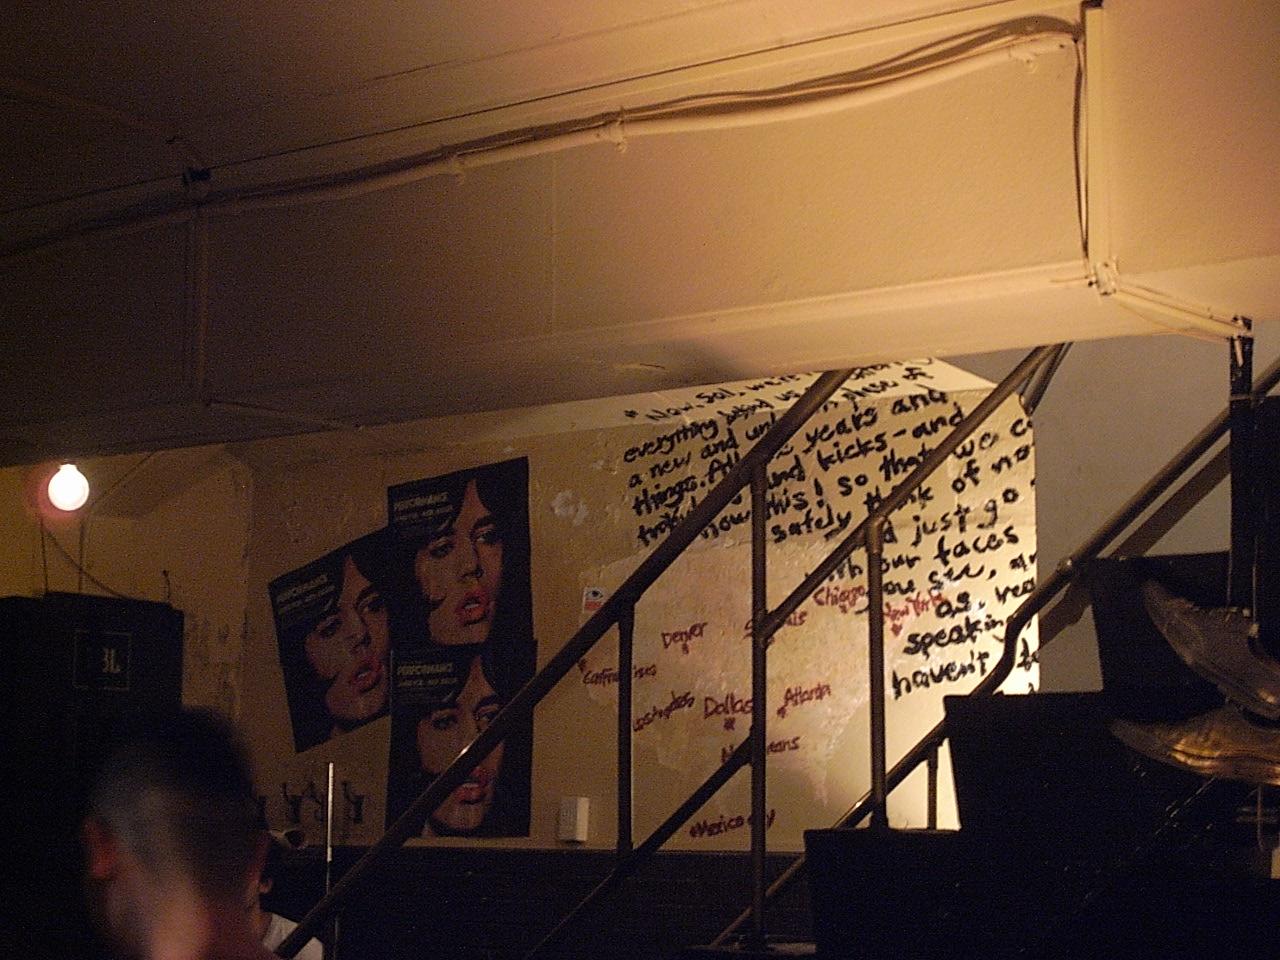 Outstanding 5/3はstimのライブを見に横浜 jack cafe basementへ。 1280 x 960 · 348 kB · jpeg